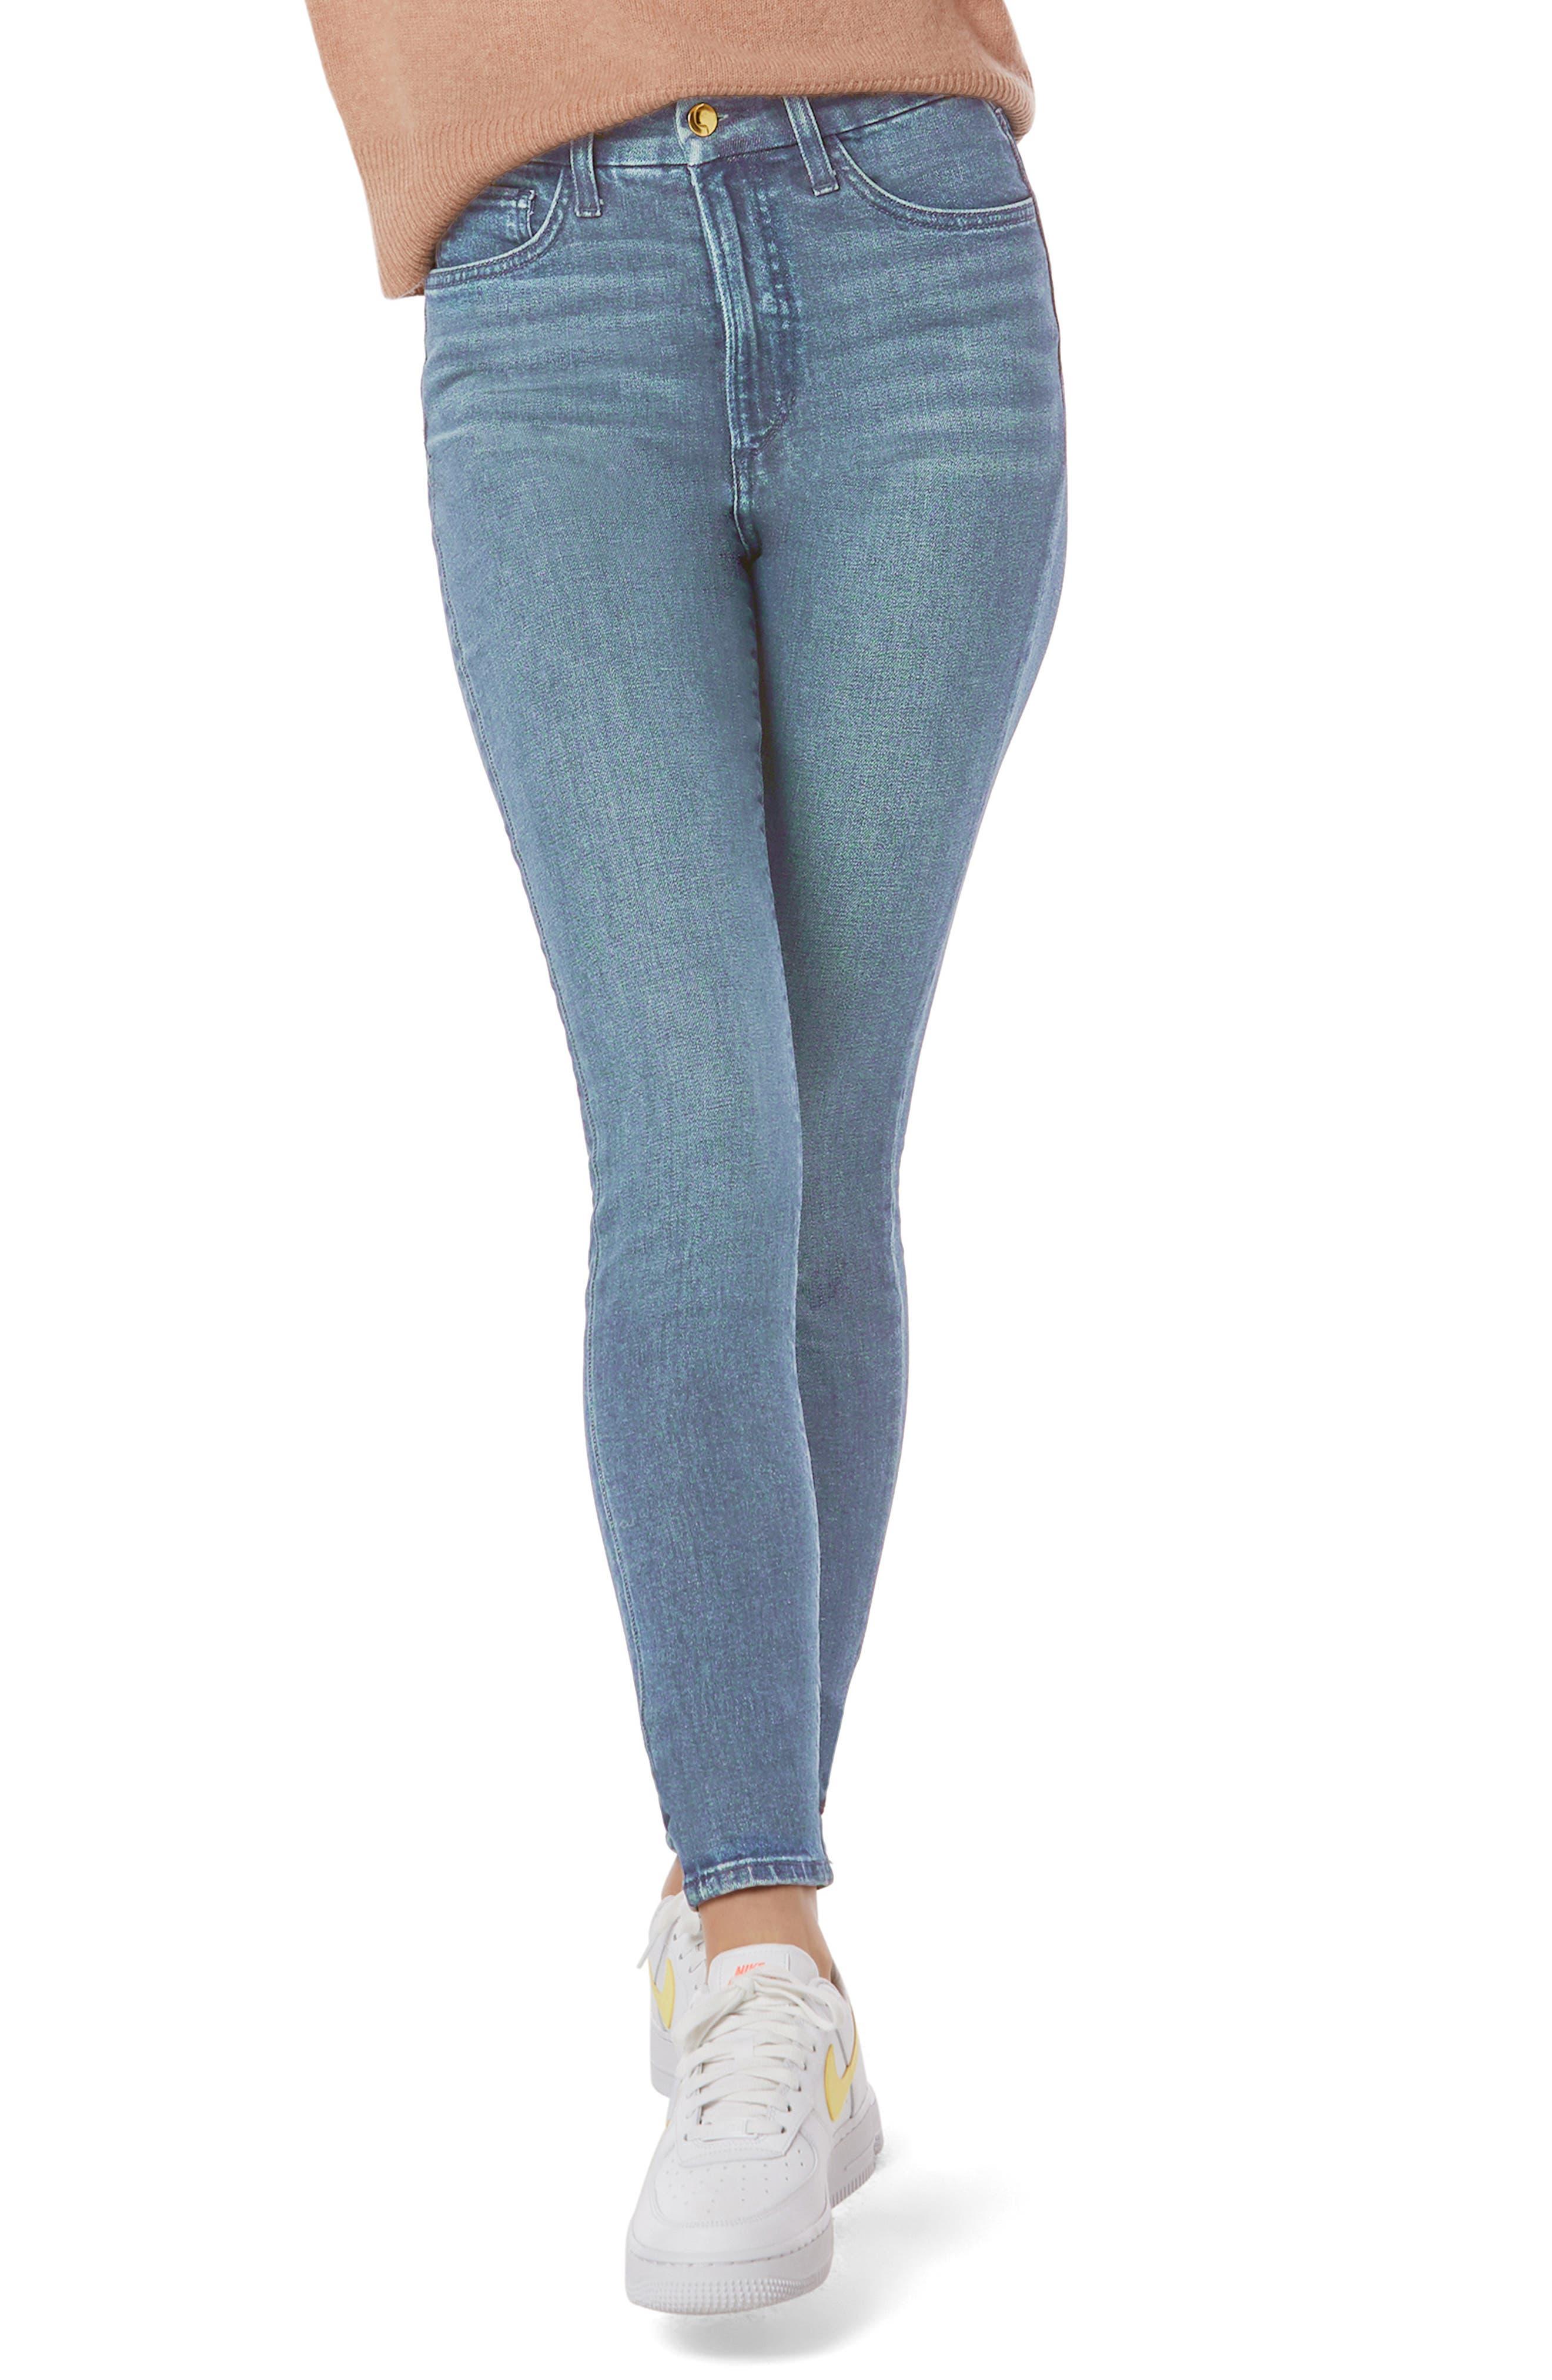 The Sara High Waist Skinny Jeans